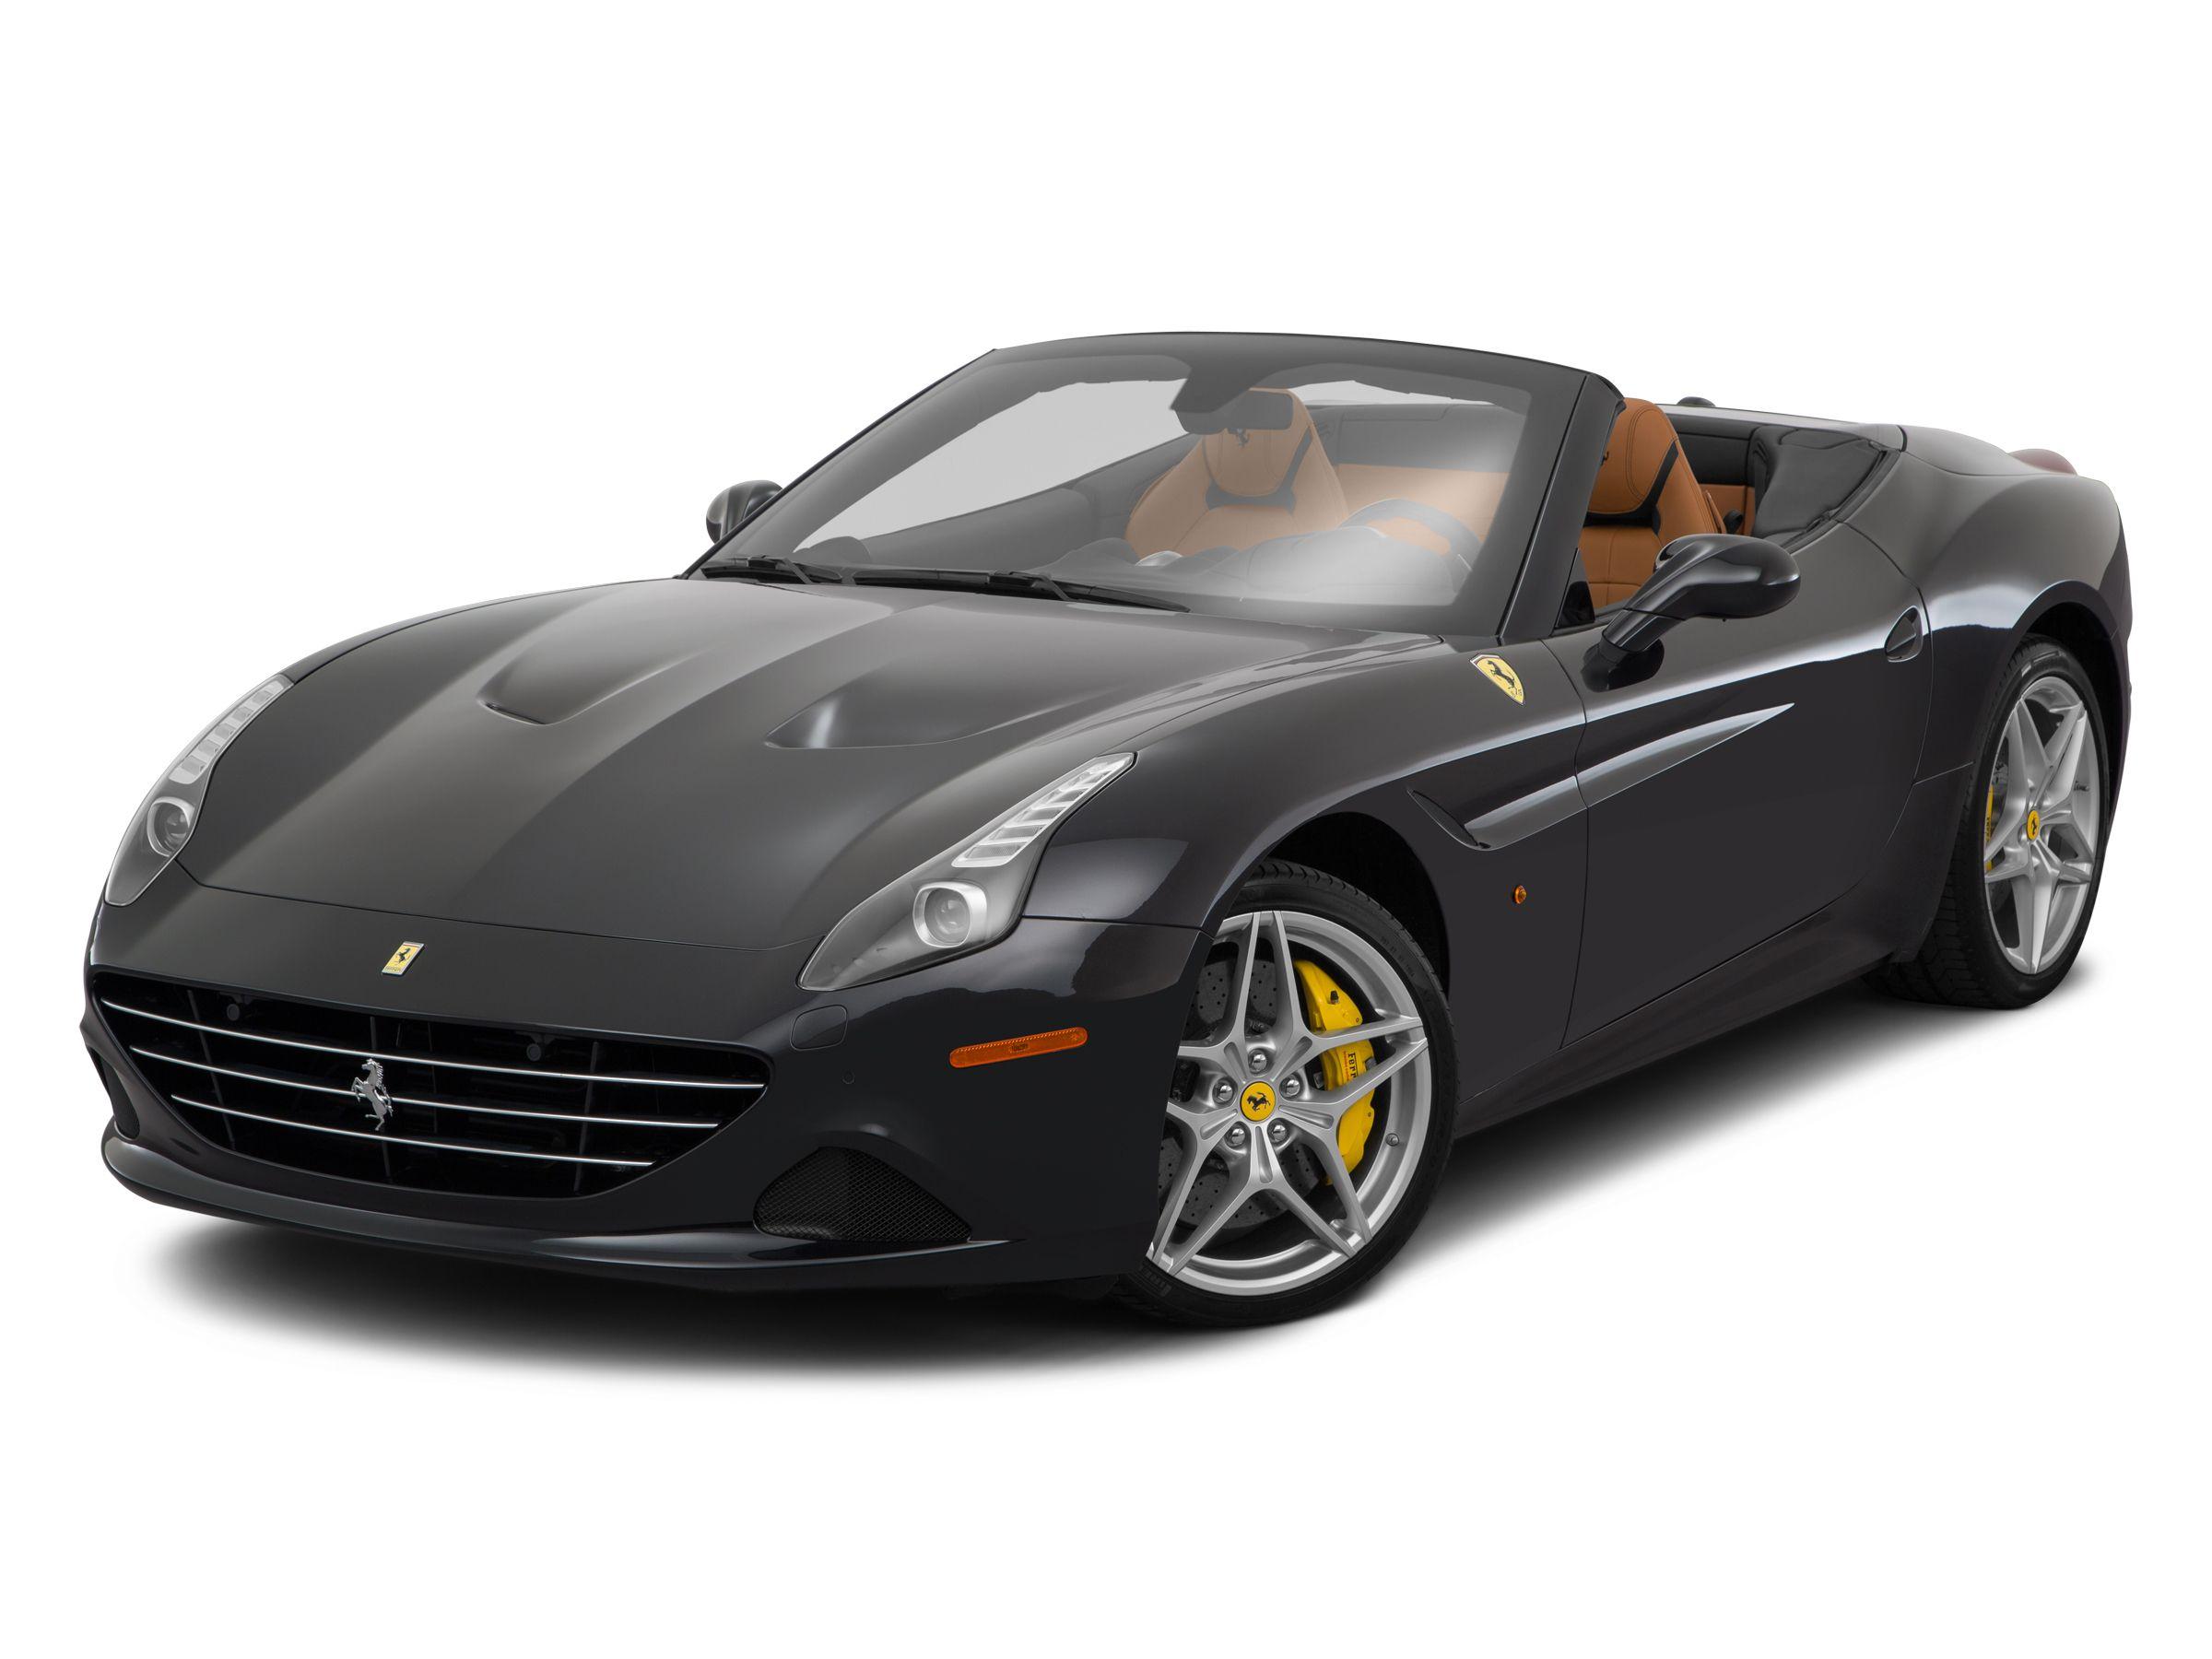 2015 Ferrari California T USspec '2014н.в.